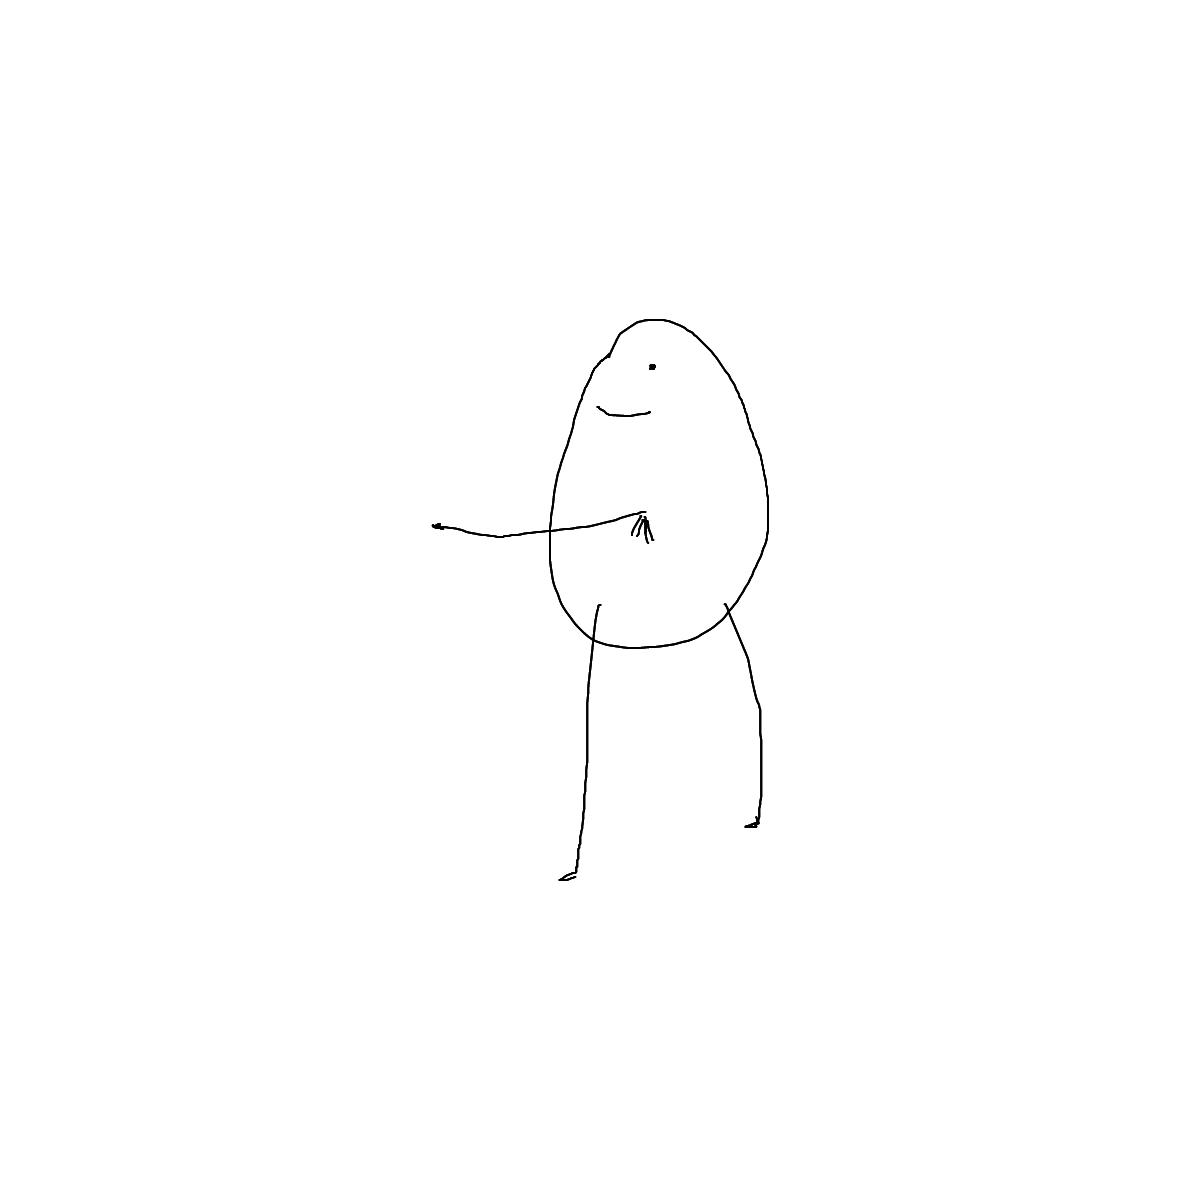 BAAAM drawing#2129 lat:52.4750595092773440lng: 13.4067678451538090